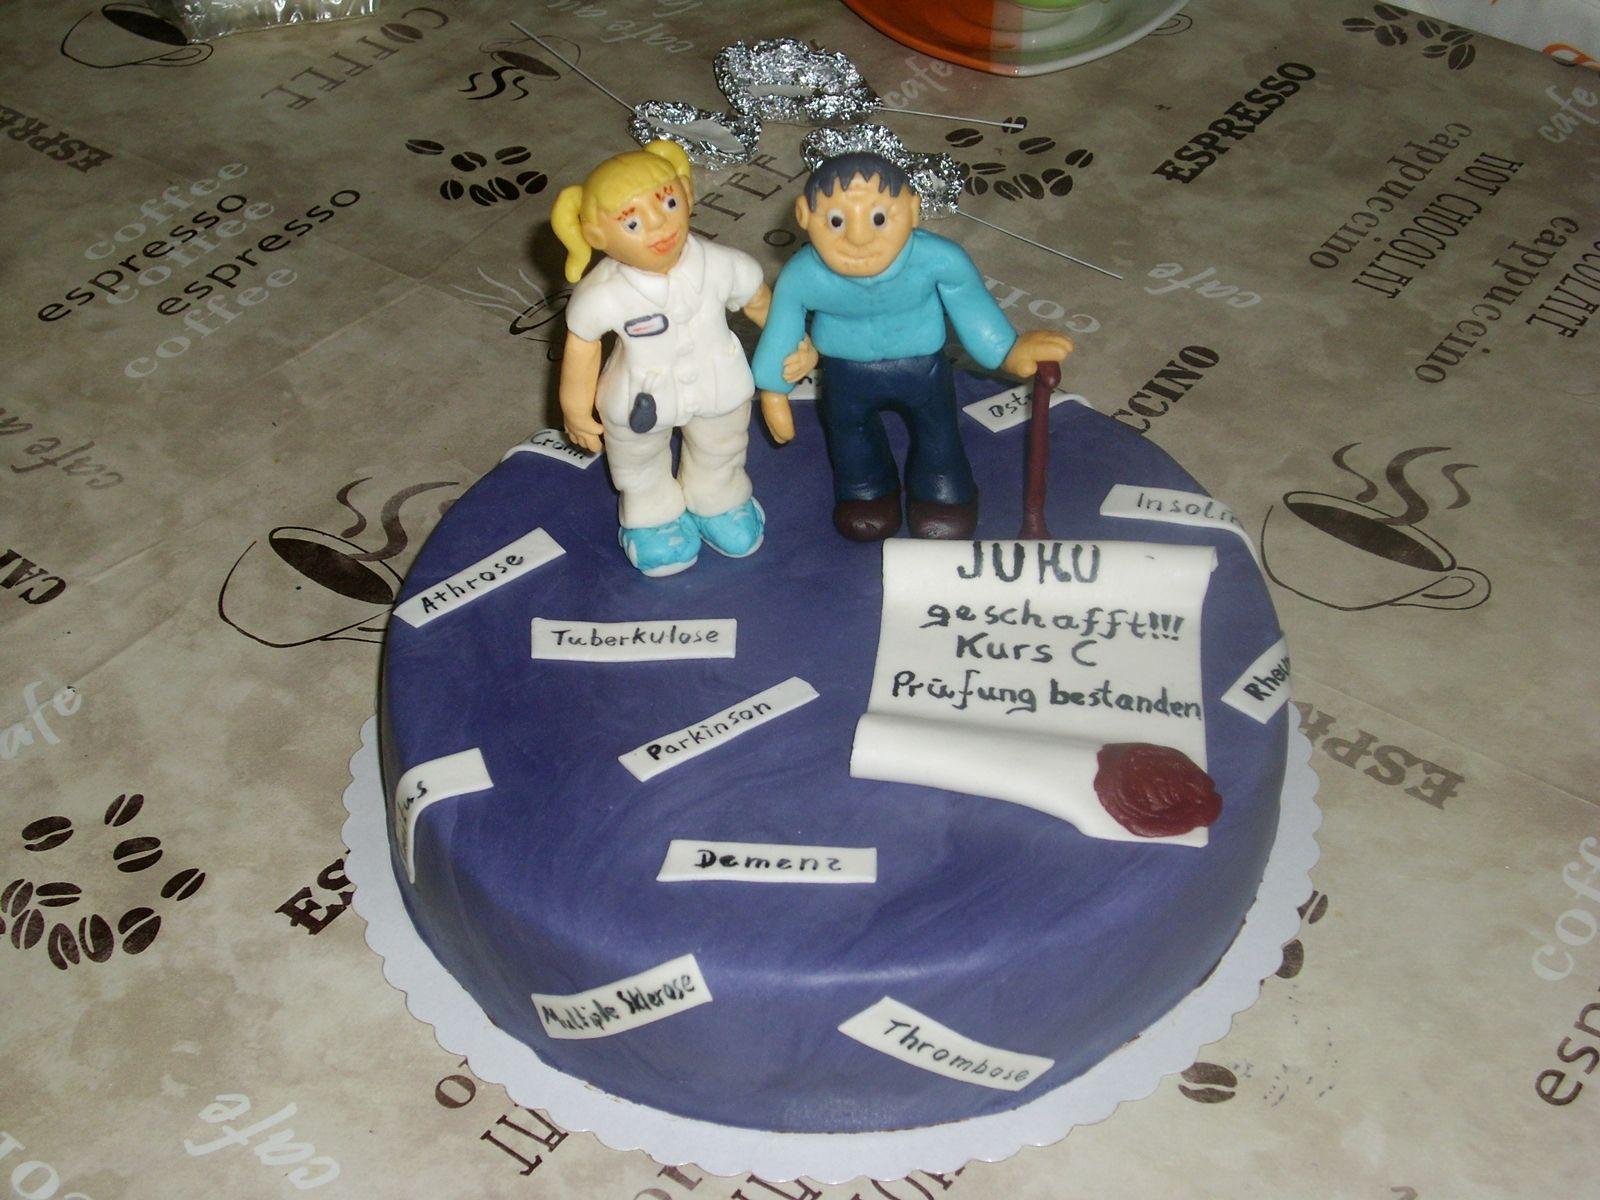 Elderly care exam cake Examen Altenpflege Torte